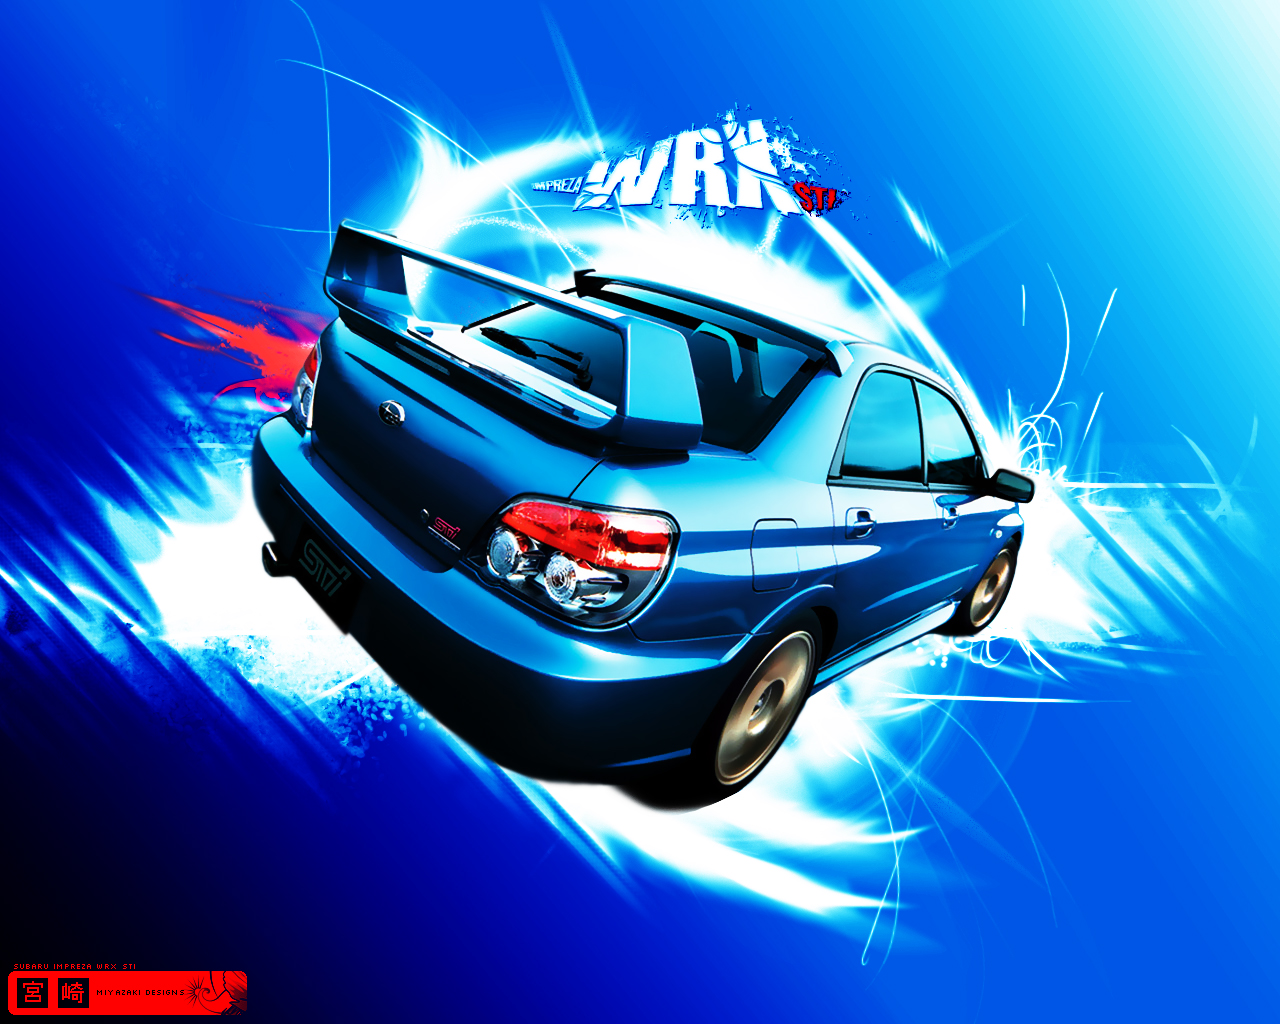 Subaru Wrx Logo Wallpaper Subaru Wrx Sti Wallpaper 1280x1024